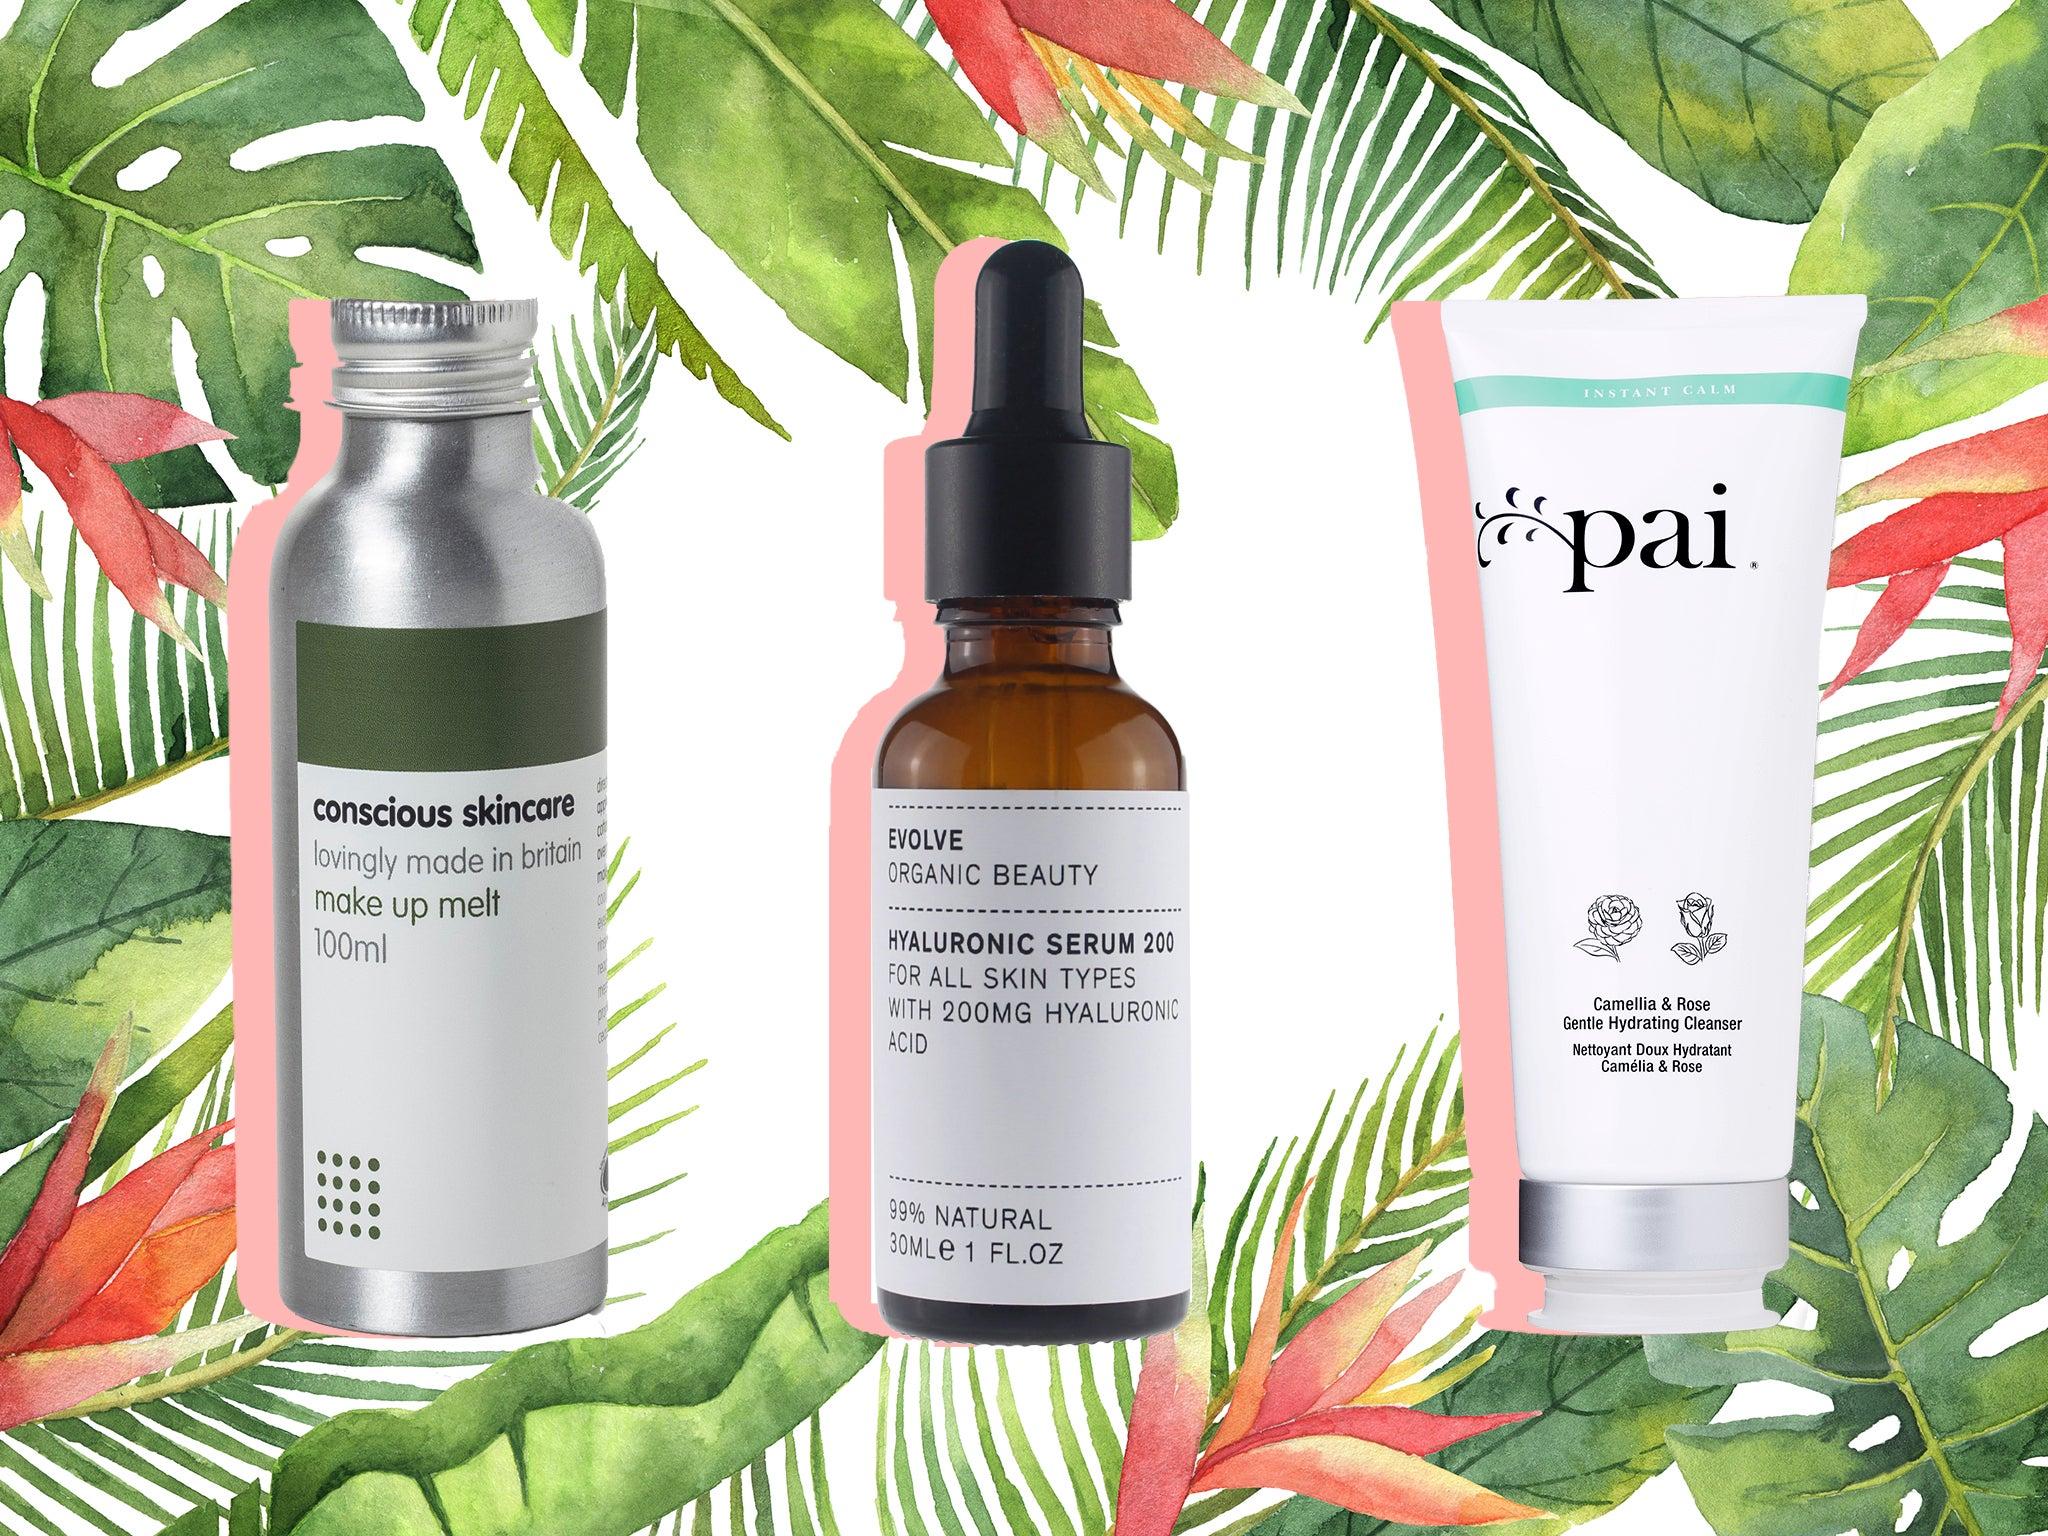 Rose hand cream, Health & Beauty, Skin, Bath, & Body on